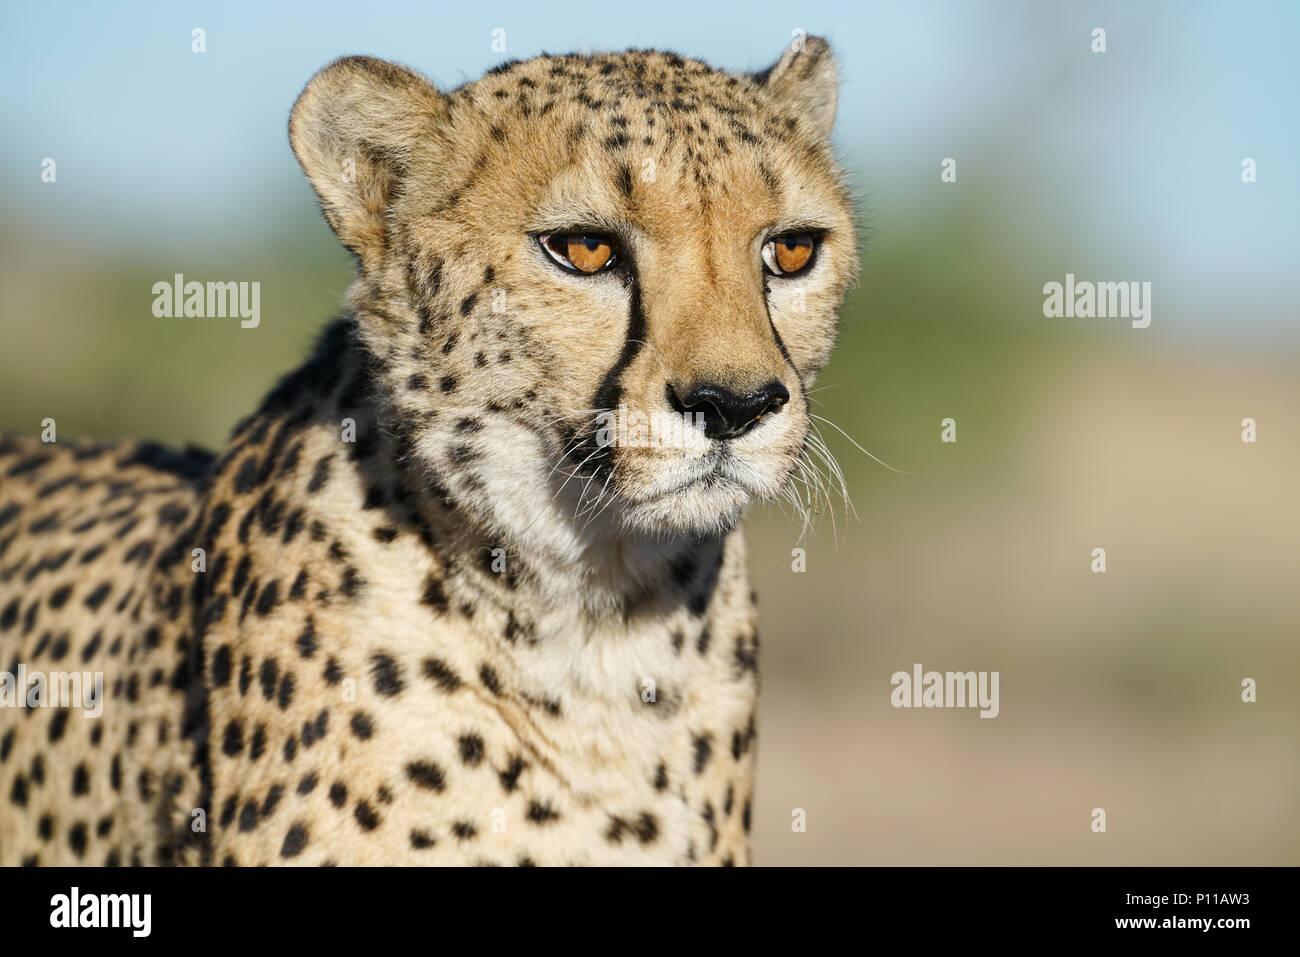 Cheetah in Namibia - Stock Image